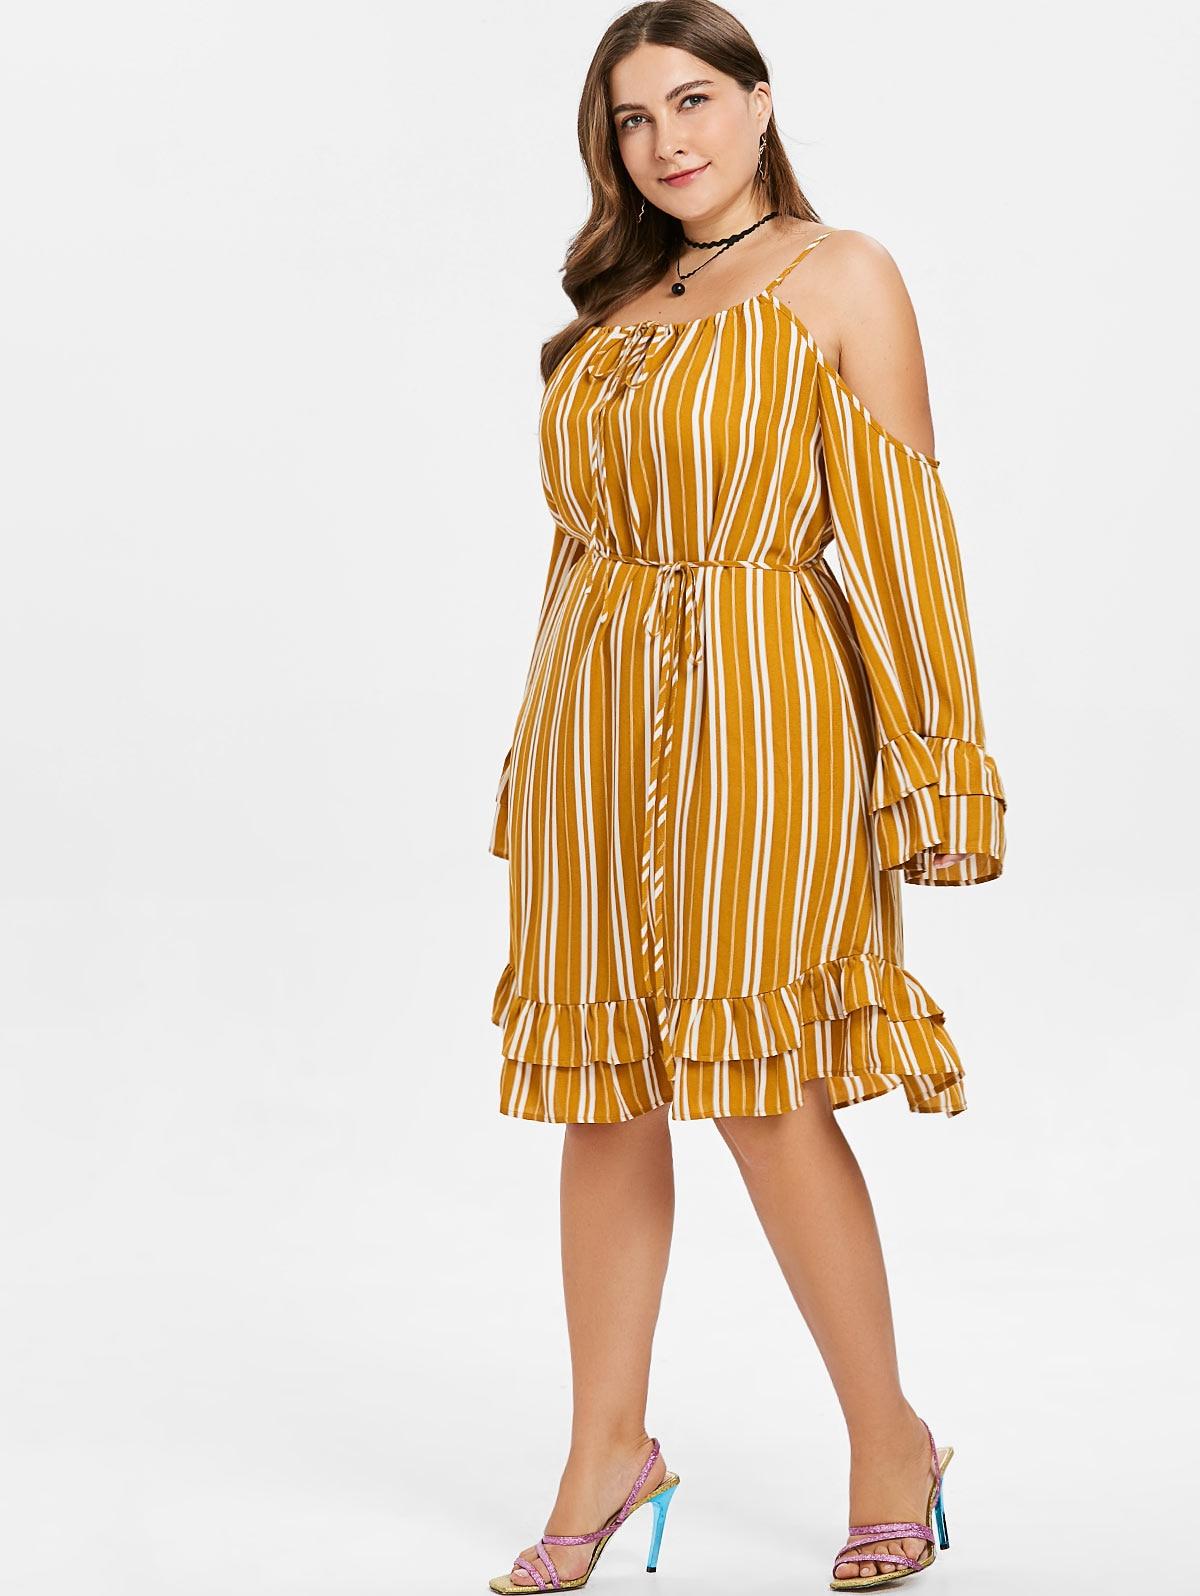 Dresses Length Mini Neckline Spaghetti Strap Sleeve Type Flare Sleeve  Sleeve Length Long Sleeves Embellishment Ruffles Pattern Type Striped With  Belt Yes c44a070f7bb2